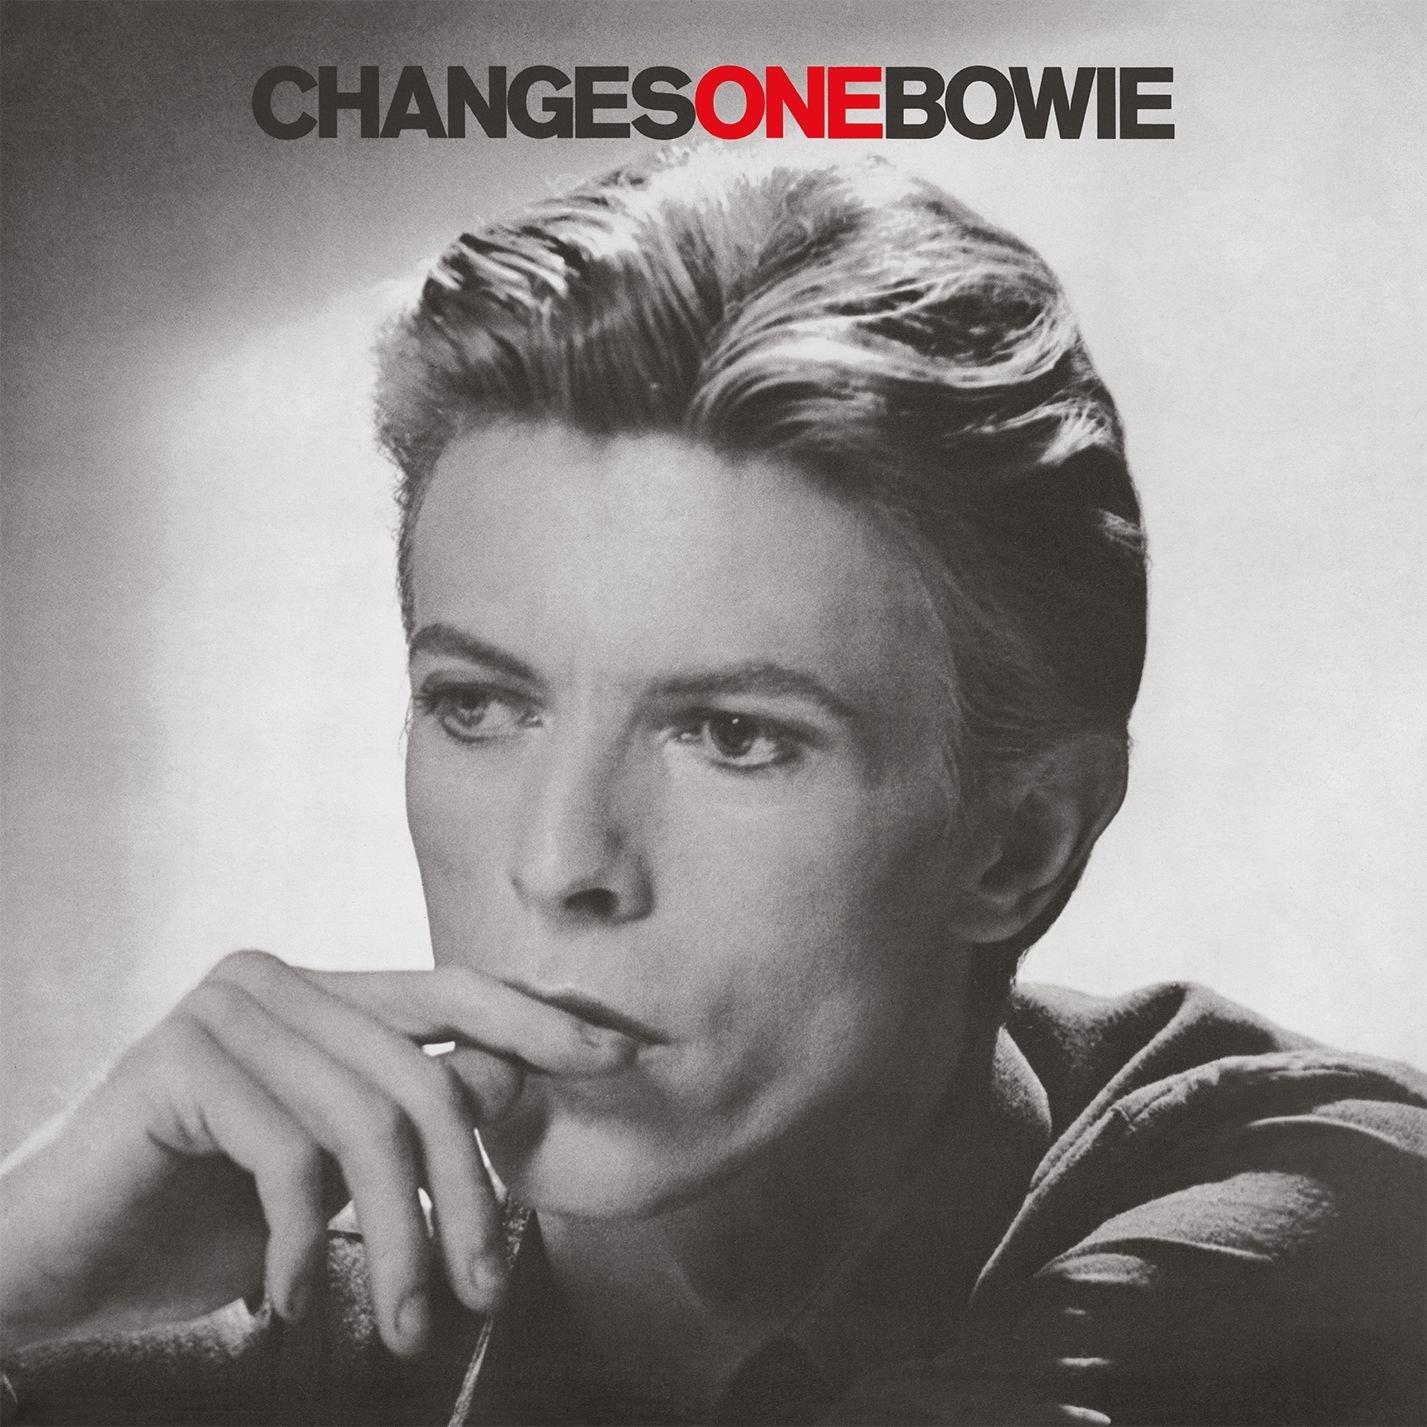 David Bowie changesonebowie Vinyl (180g) back to $11.76 @ Amazon or Walmart